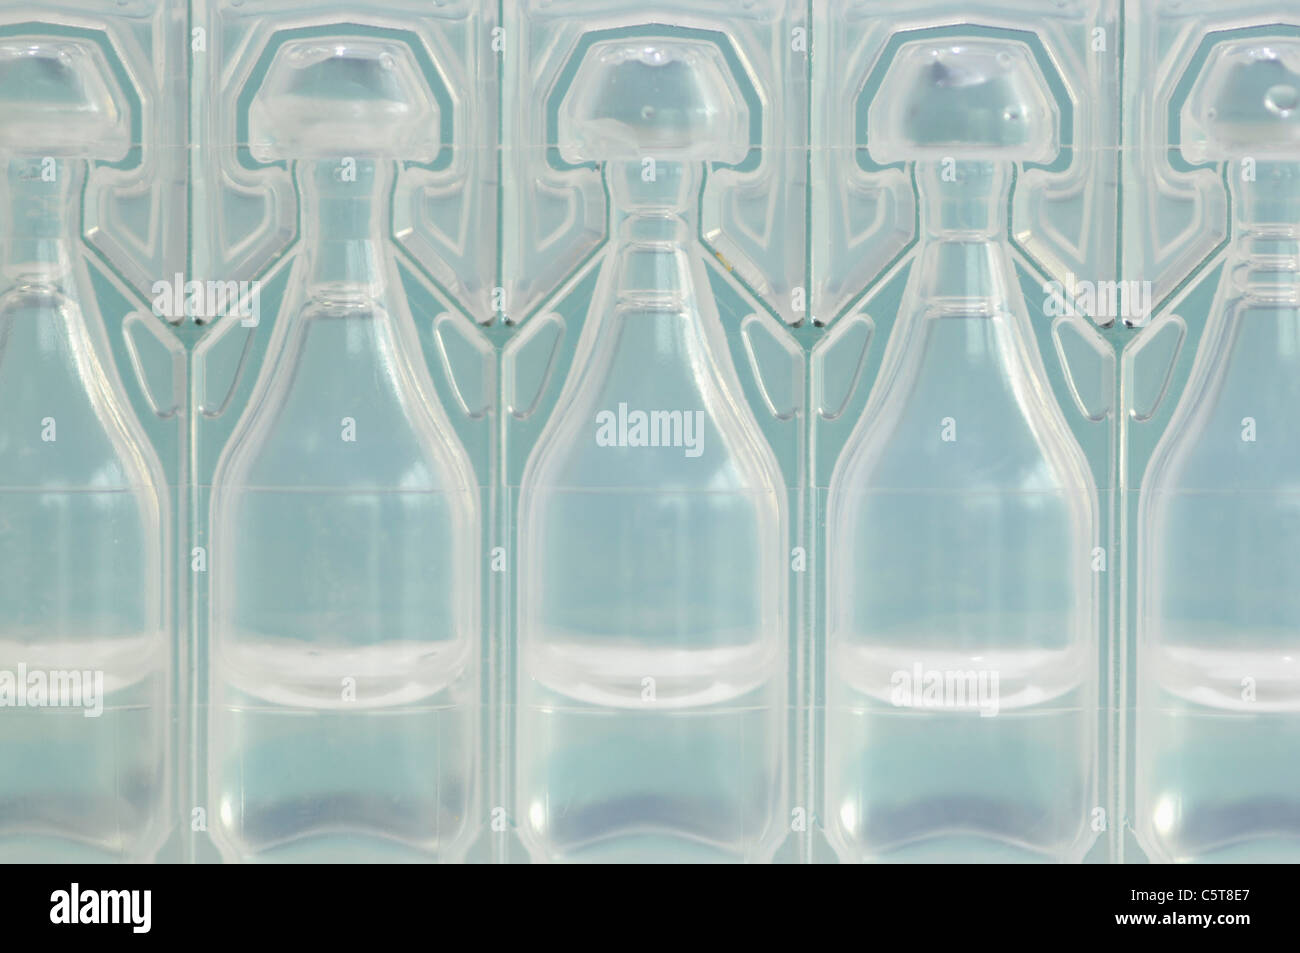 Fiale in plastica in una fila, full frame, close-up Immagini Stock